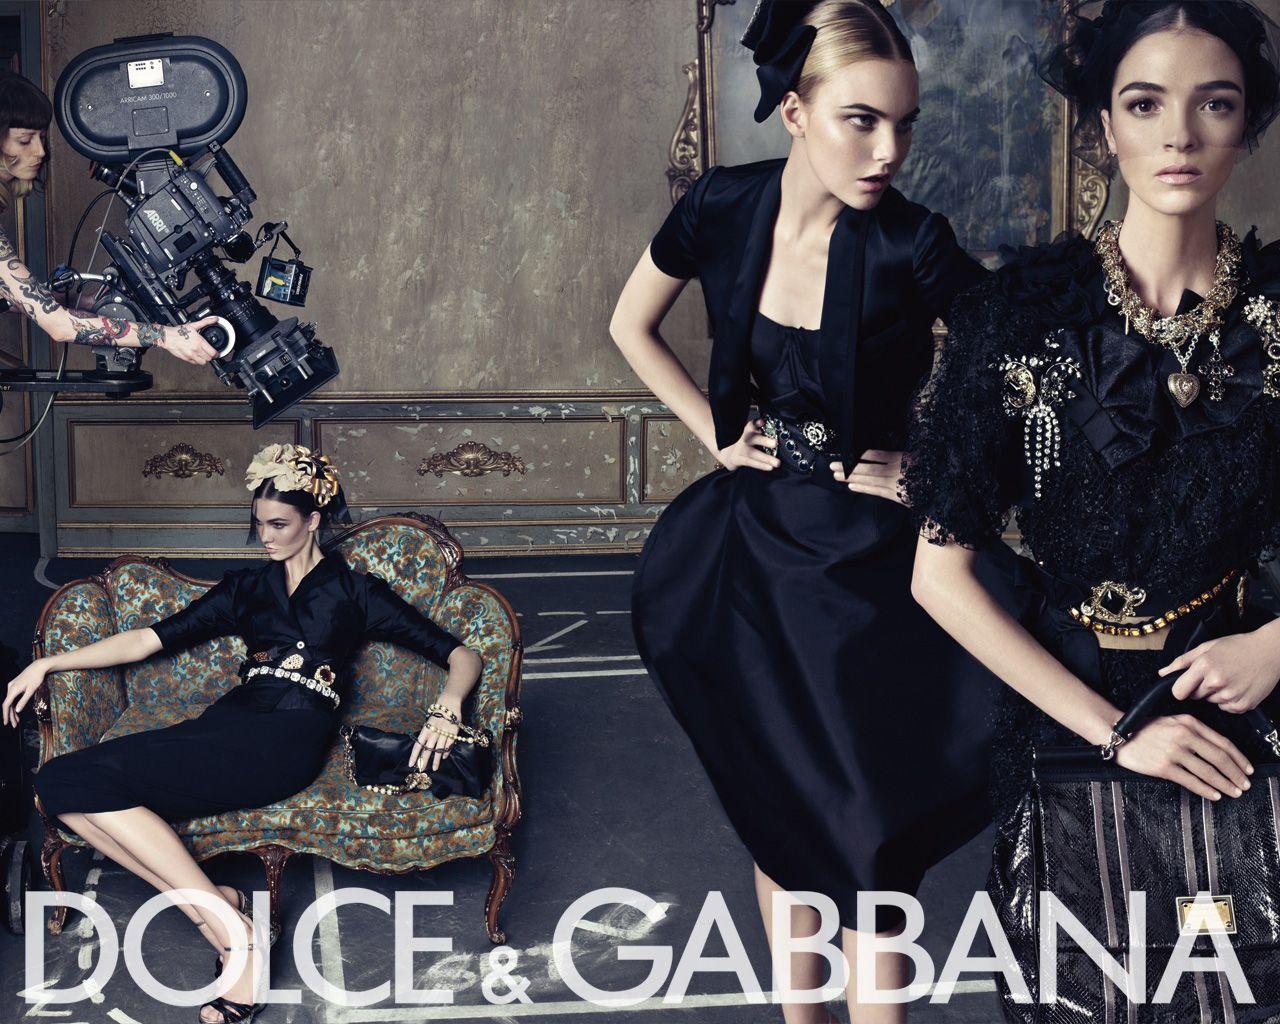 ae8db2377feb33 Maria Carla Boscono for Dolce Gabbana (  fashionphoto  fashion  topmodel   beauty  MariaCarlaBoscono  Boscono  DolceGabbana  beautymanka )